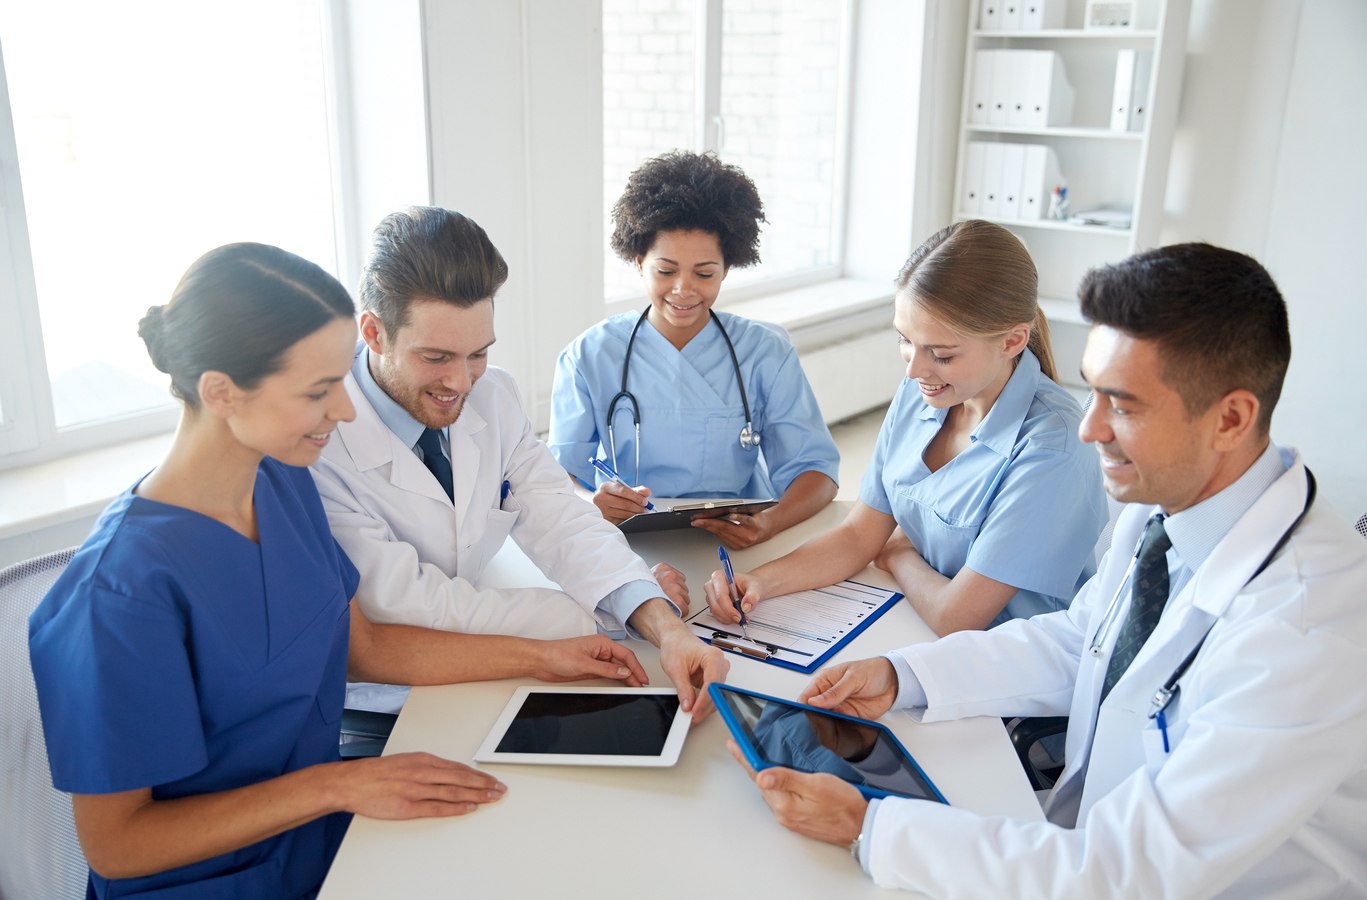 Hospital trainee -Egypt- Good health and well beingGV